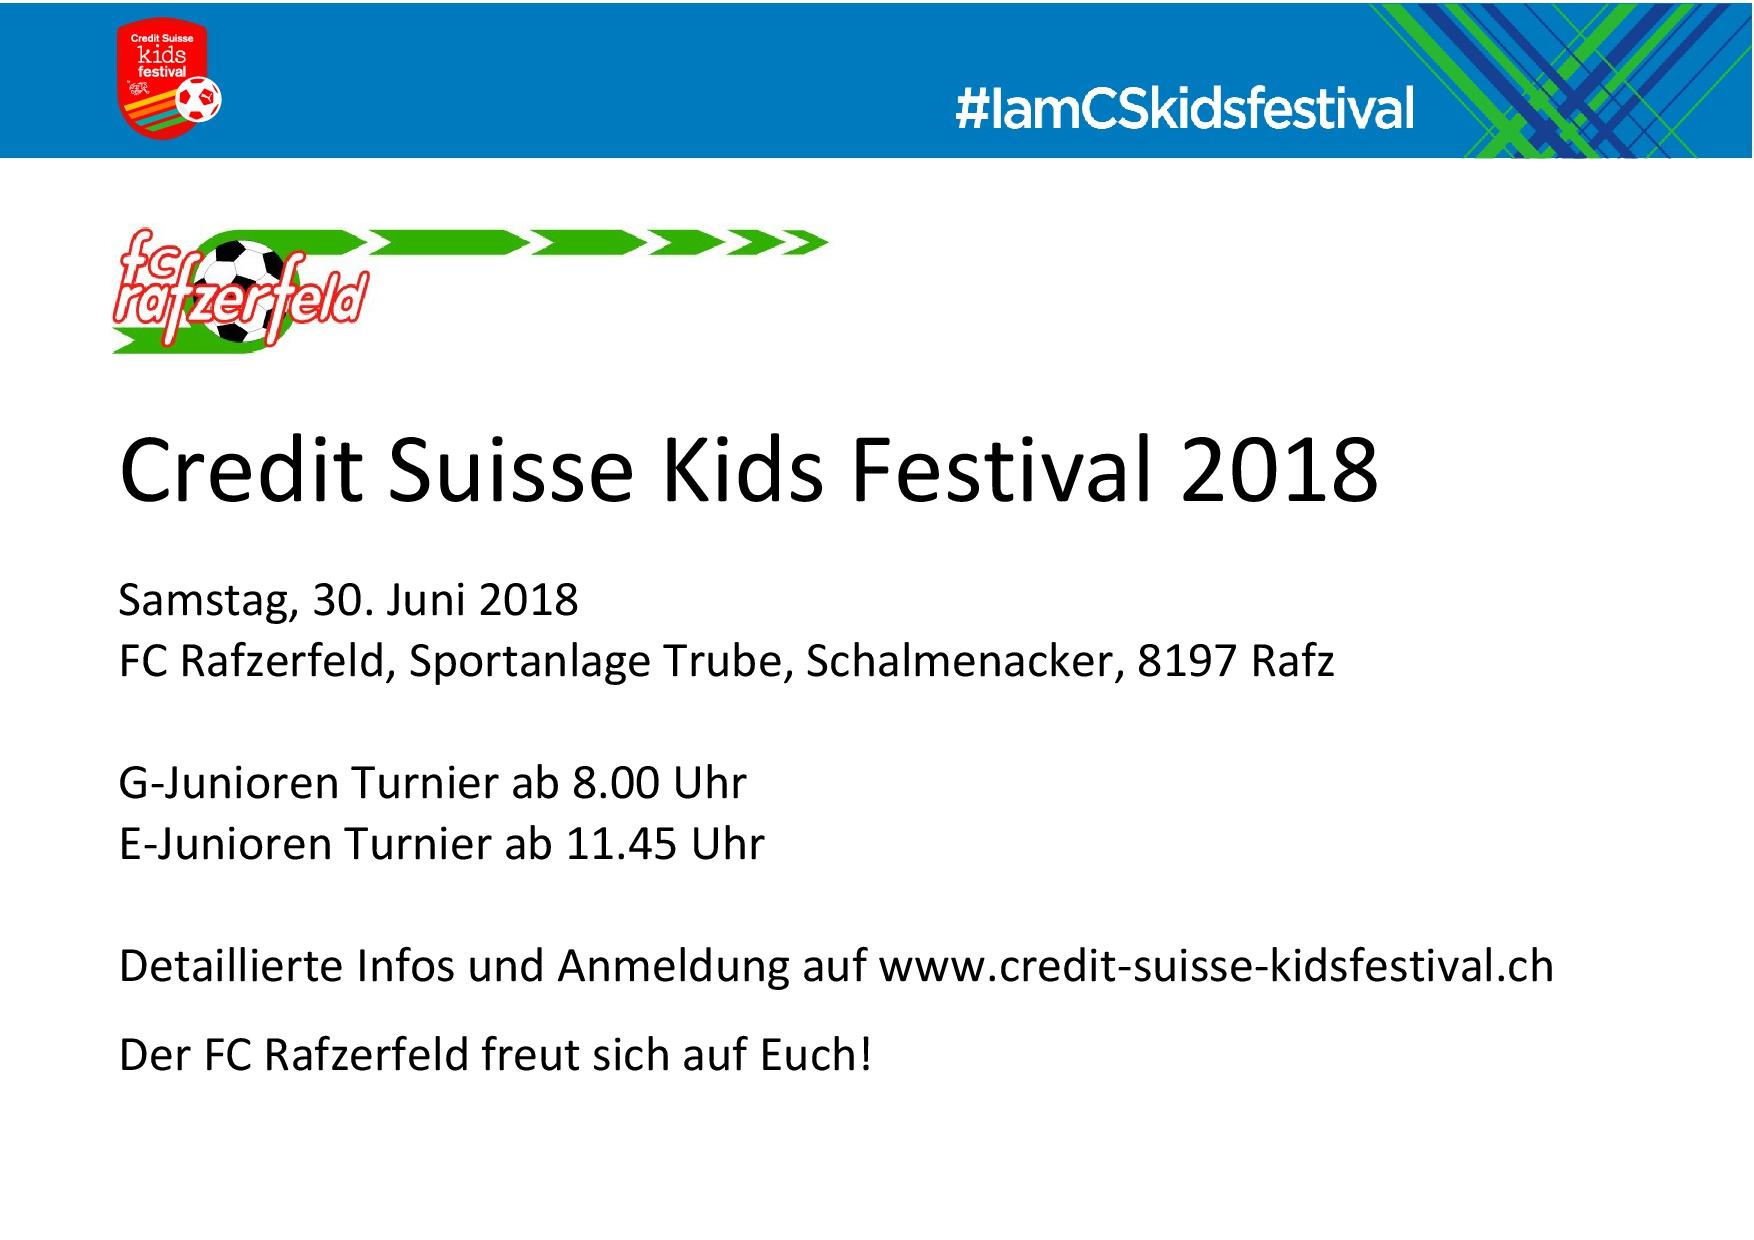 Credit Suisse KidsFestival 2018